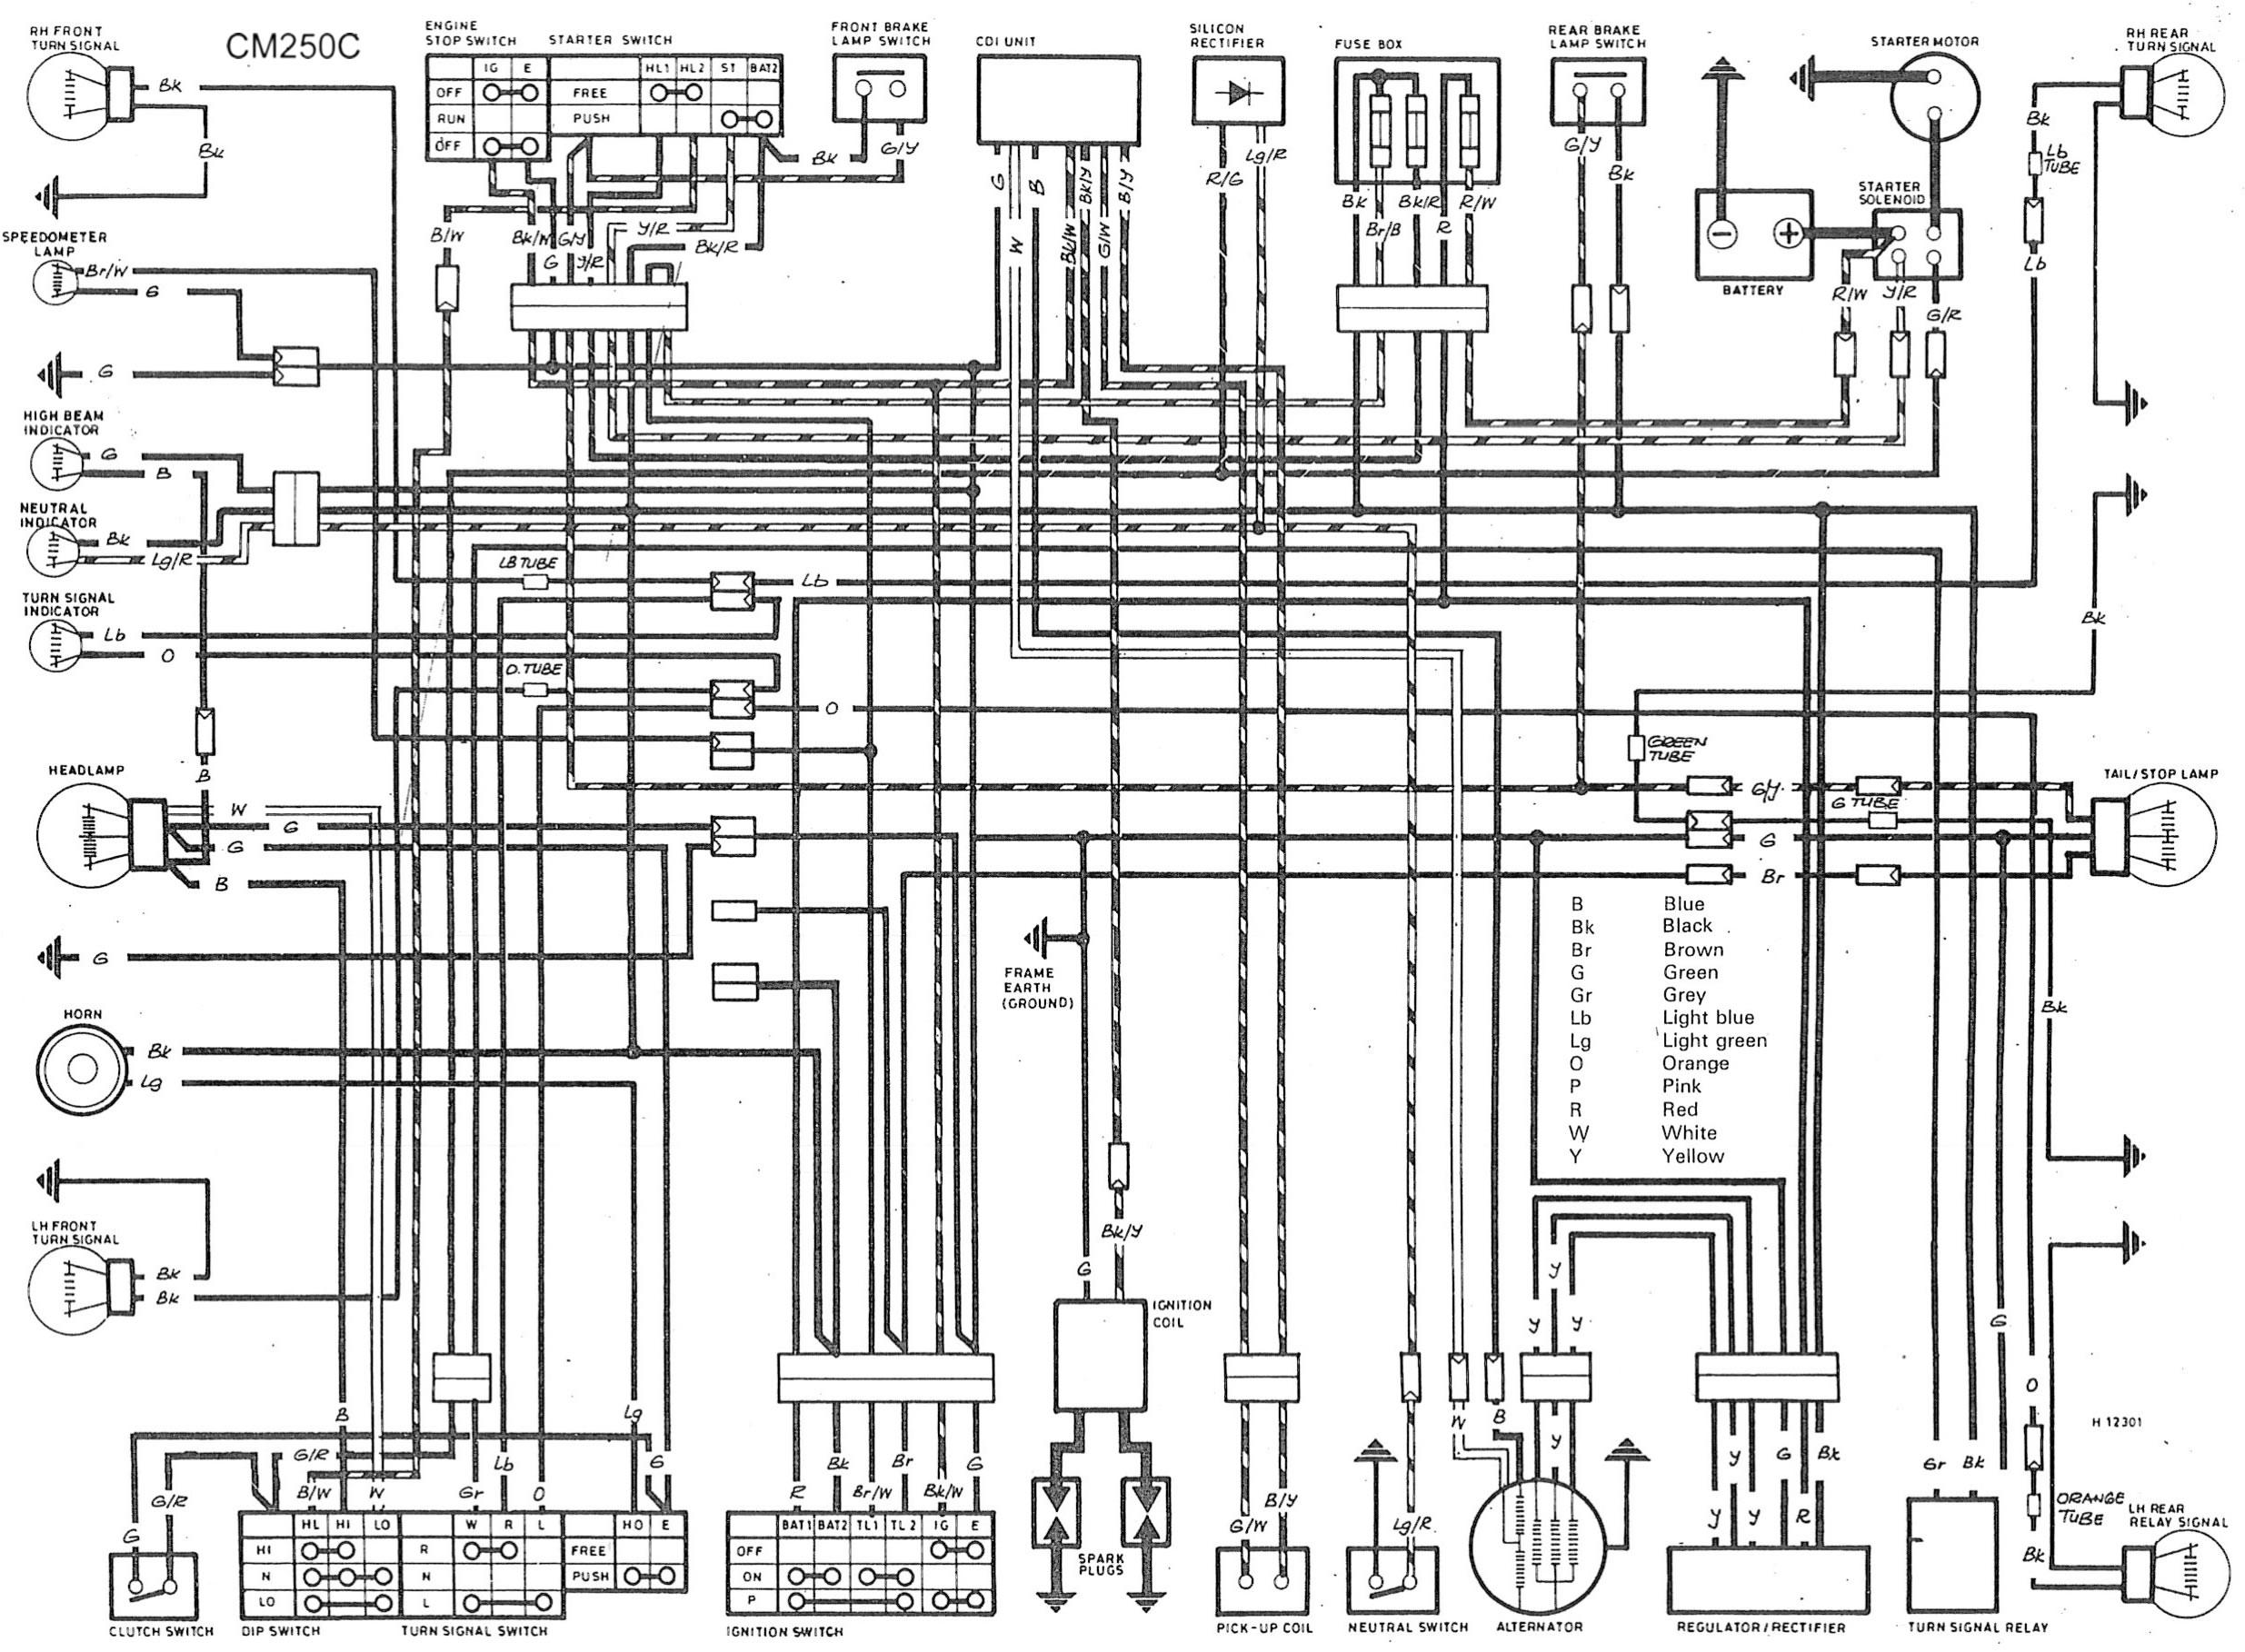 Yamaha Virago 1100 Fuse Box Location - Guide And Troubleshooting Of on yamaha v star 650 classic wiring diagram, suzuki intruder 800 wiring diagram, honda shadow vlx 600 wiring diagram, yamaha xs650 wiring diagram, yamaha fz8 wiring diagram, yamaha grizzly 350 wiring diagram, suzuki savage 650 wiring diagram, yamaha vino wiring diagram, yamaha xj600 wiring diagram, yamaha virago 250 wiring diagram, honda shadow 1100 wiring diagram, yamaha fz6r wiring diagram, yamaha vmax wiring diagram, suzuki gs 750 wiring diagram, yamaha raider wiring diagram, yamaha r1 wiring diagram, kawasaki 750 wiring diagram, kawasaki vulcan 500 wiring diagram, yamaha virago 920 wiring diagram, suzuki intruder 1400 wiring diagram,